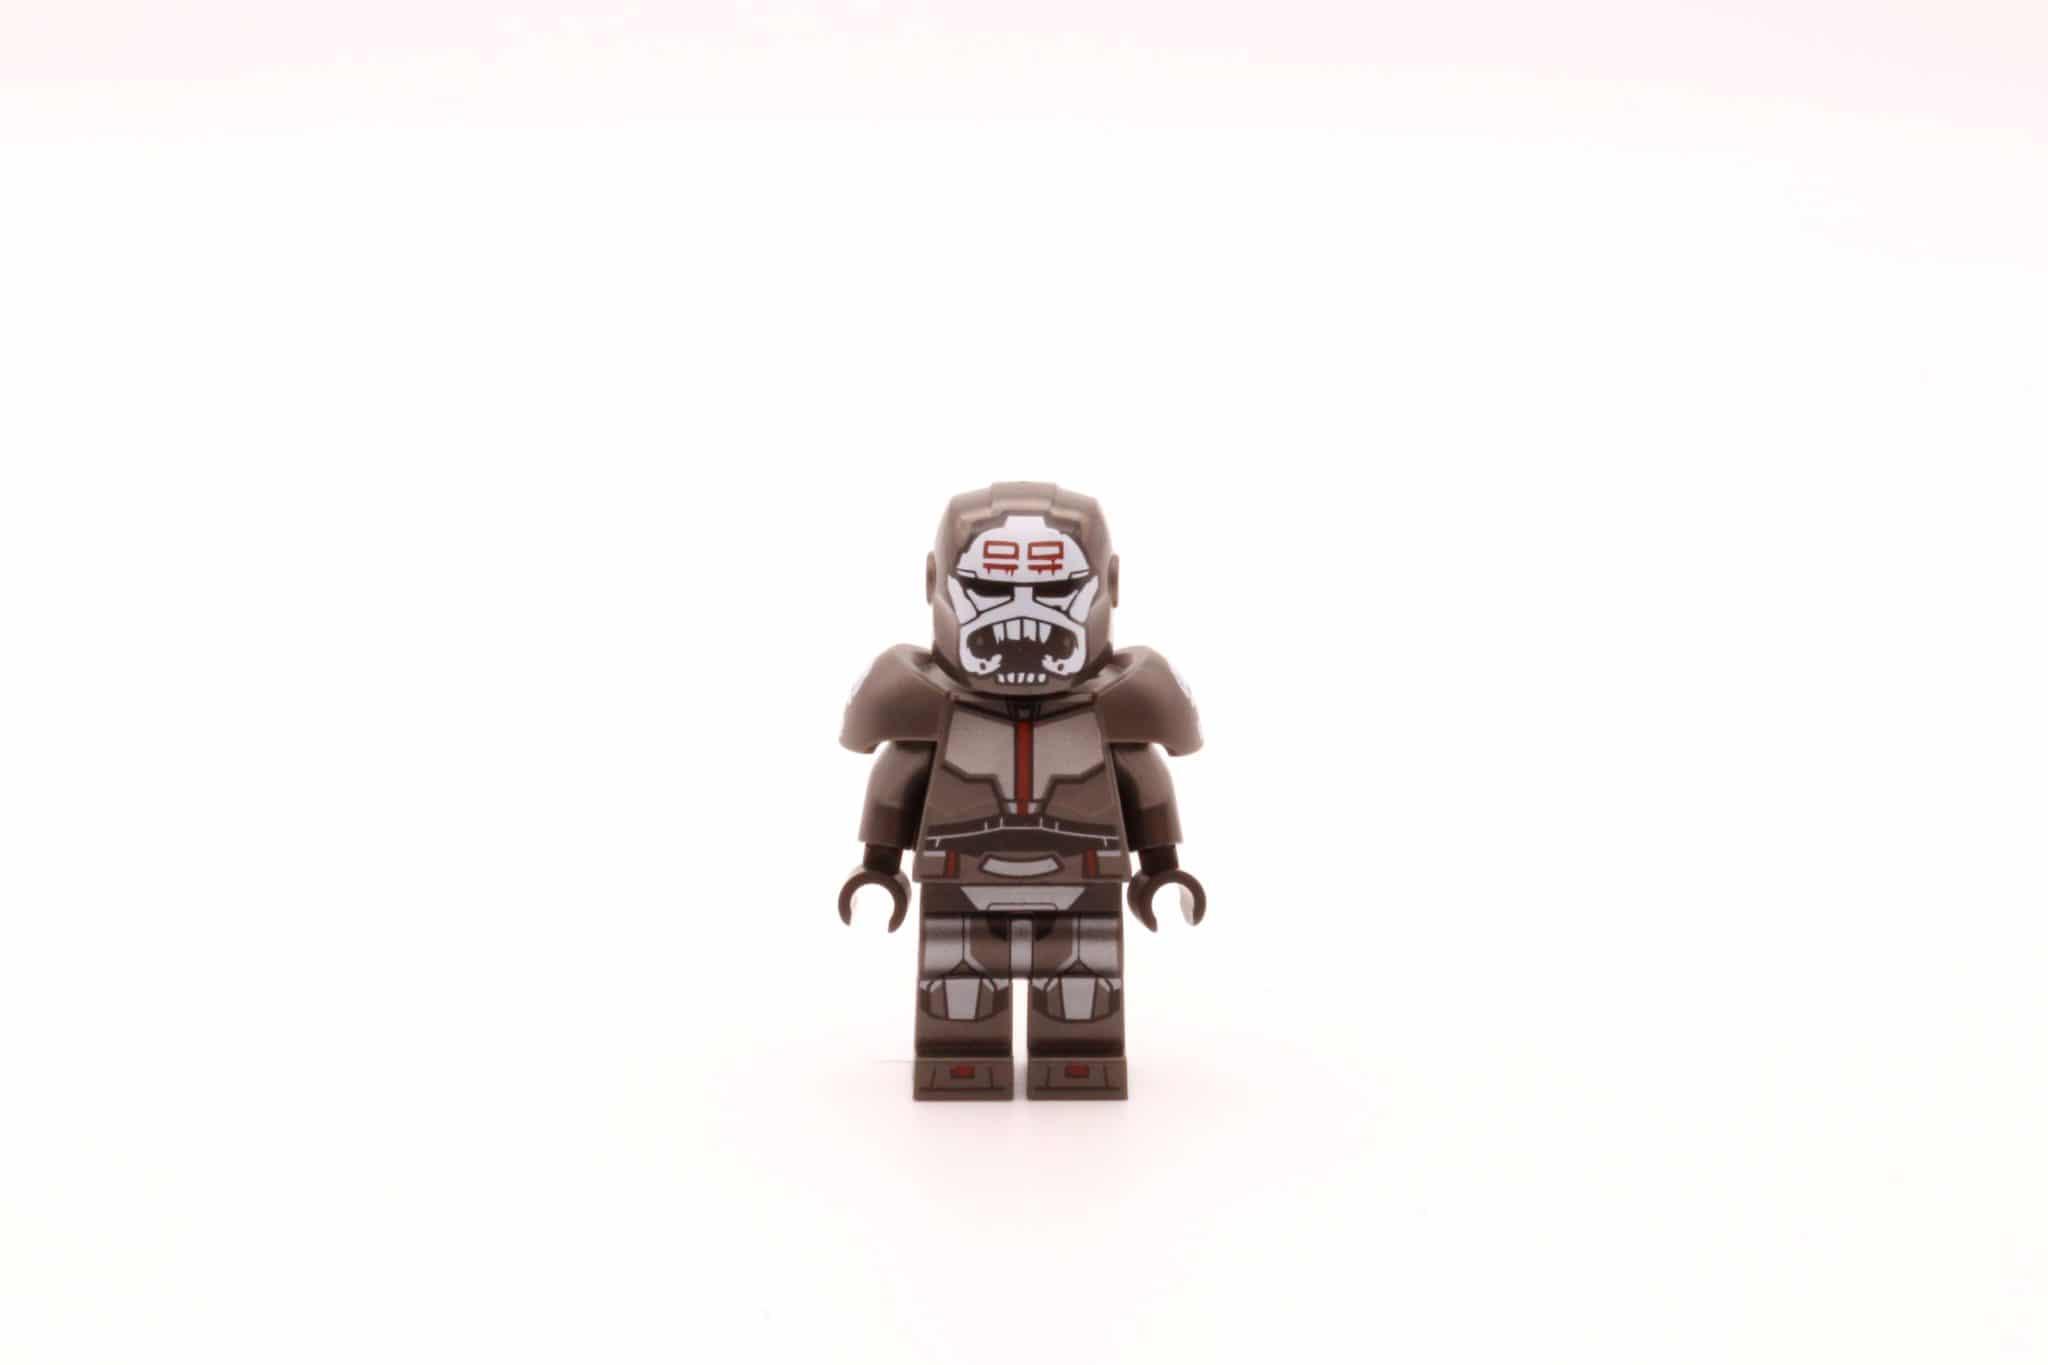 LEGO Star Wars 75314 The Bad Batch Attack Shuttle Wrecker Helm